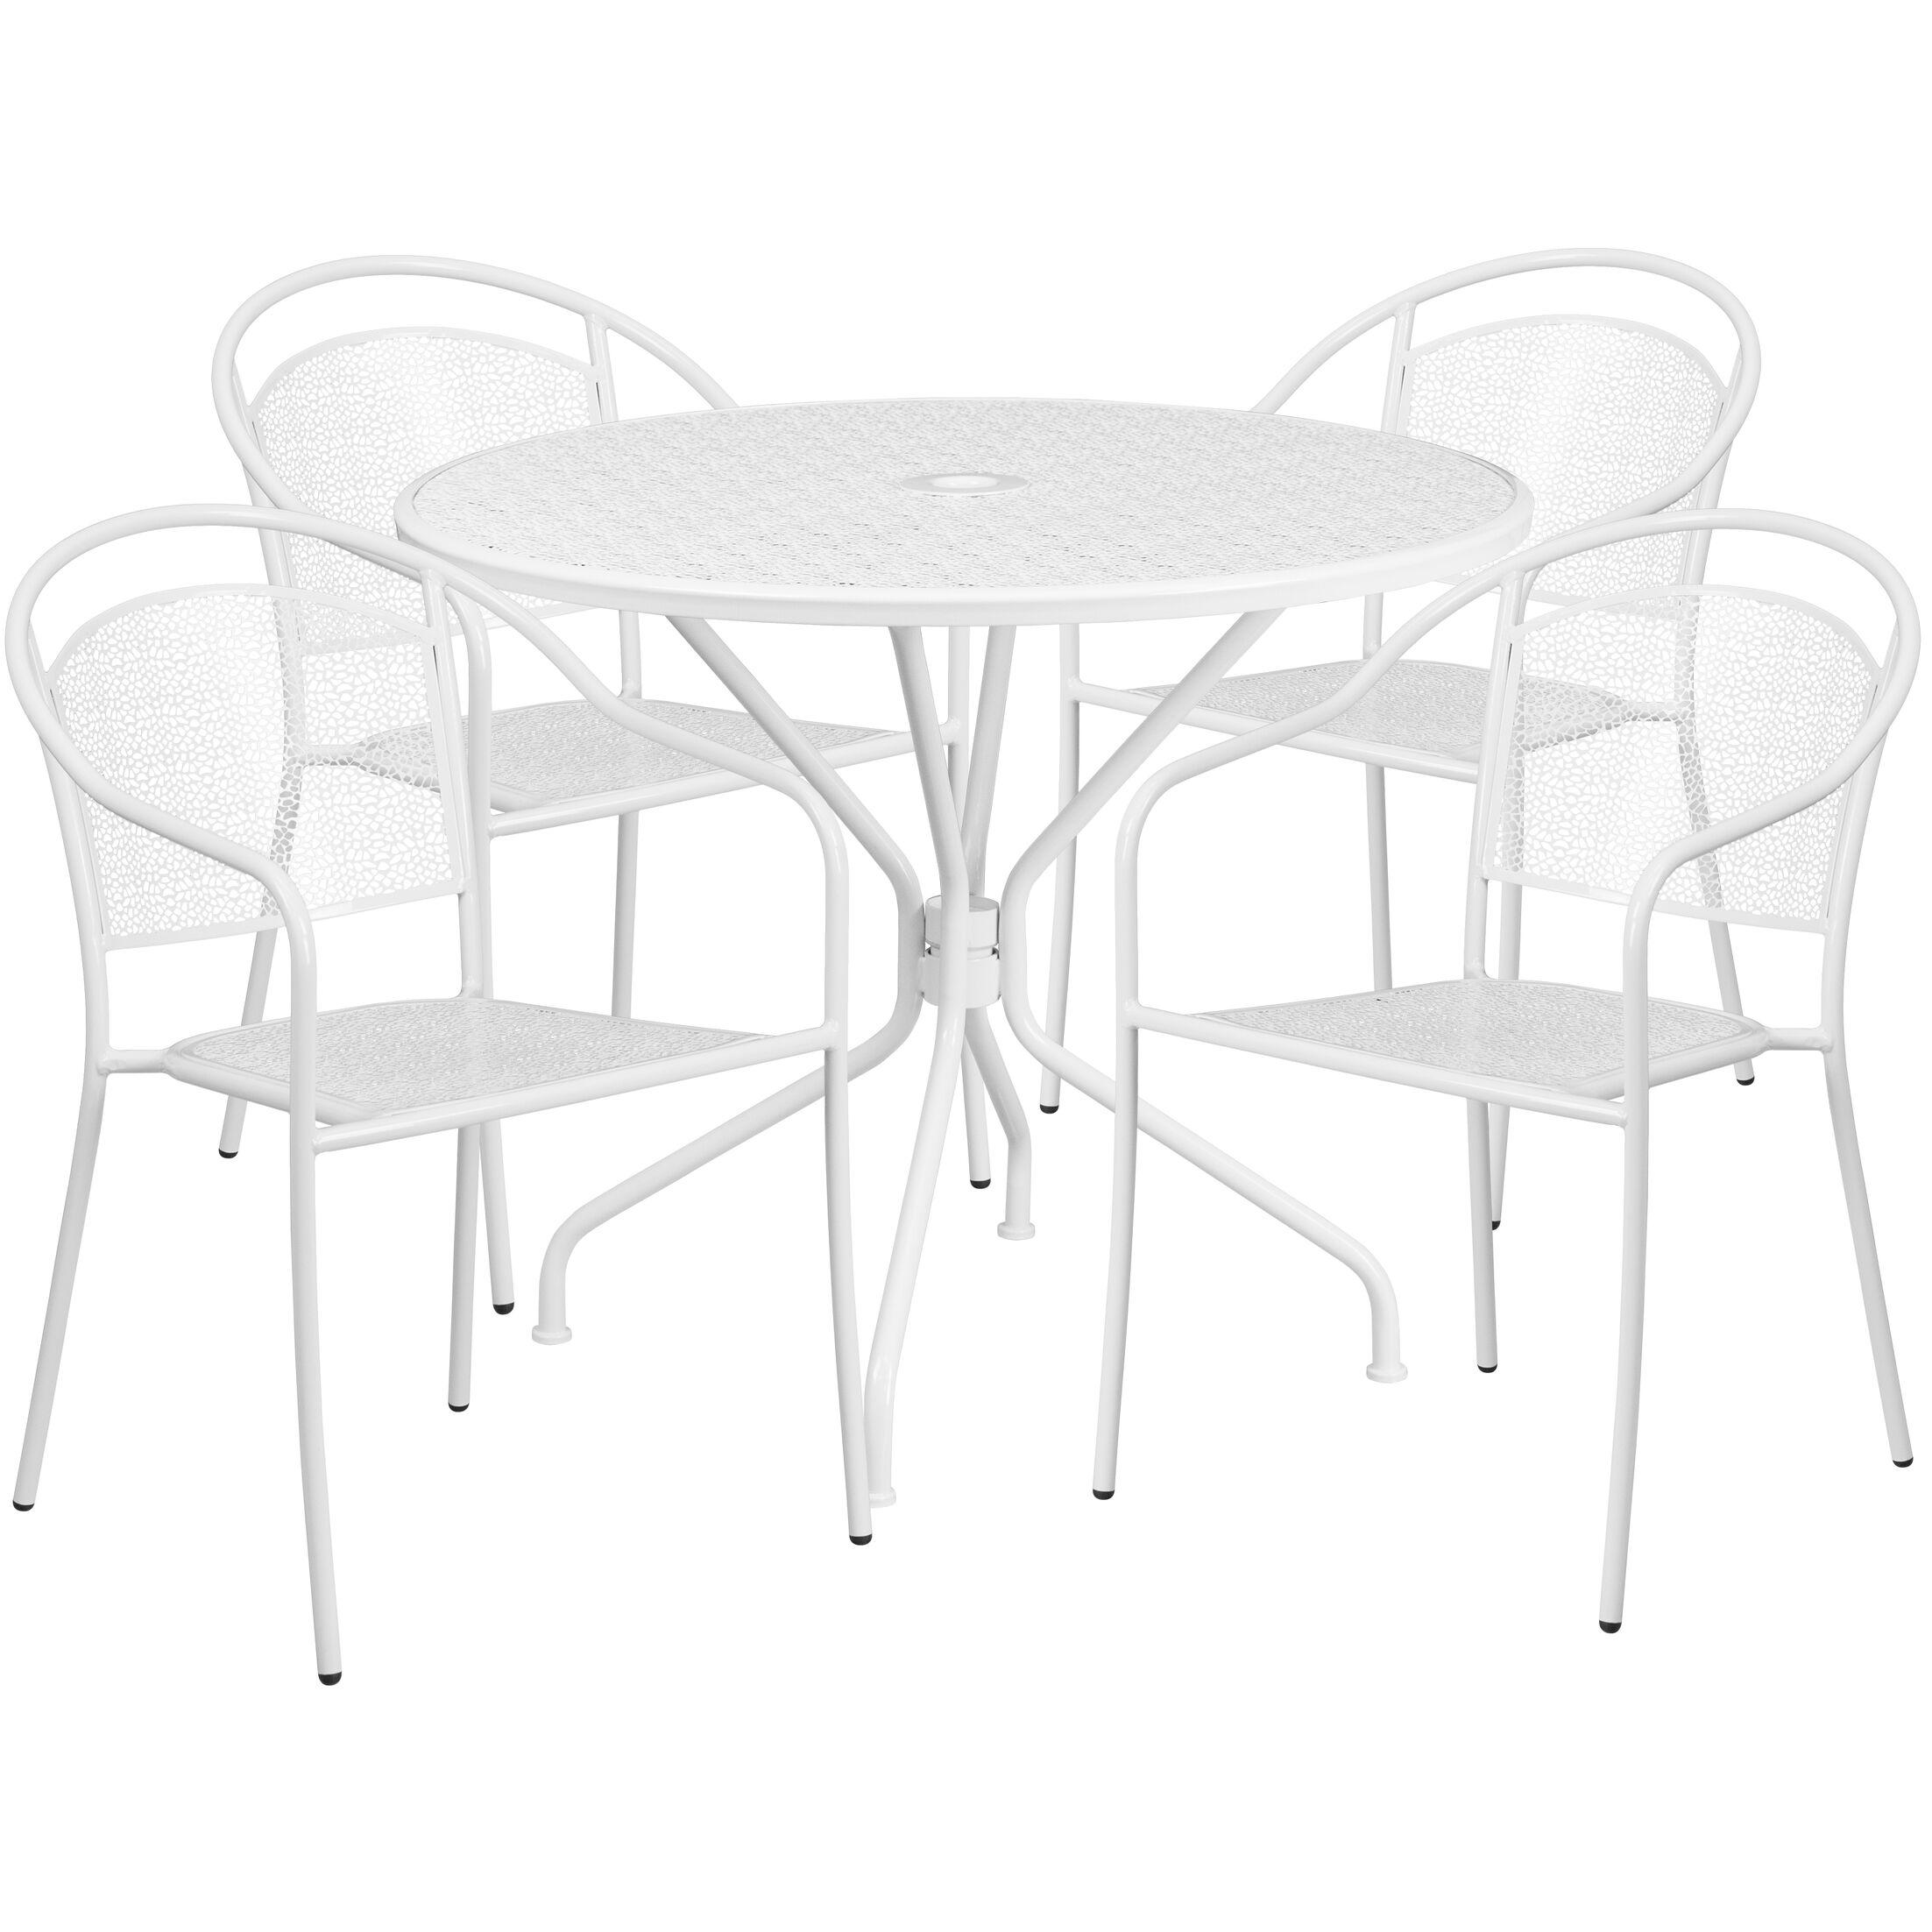 Hoyt 5 Piece Dining Set Color: White